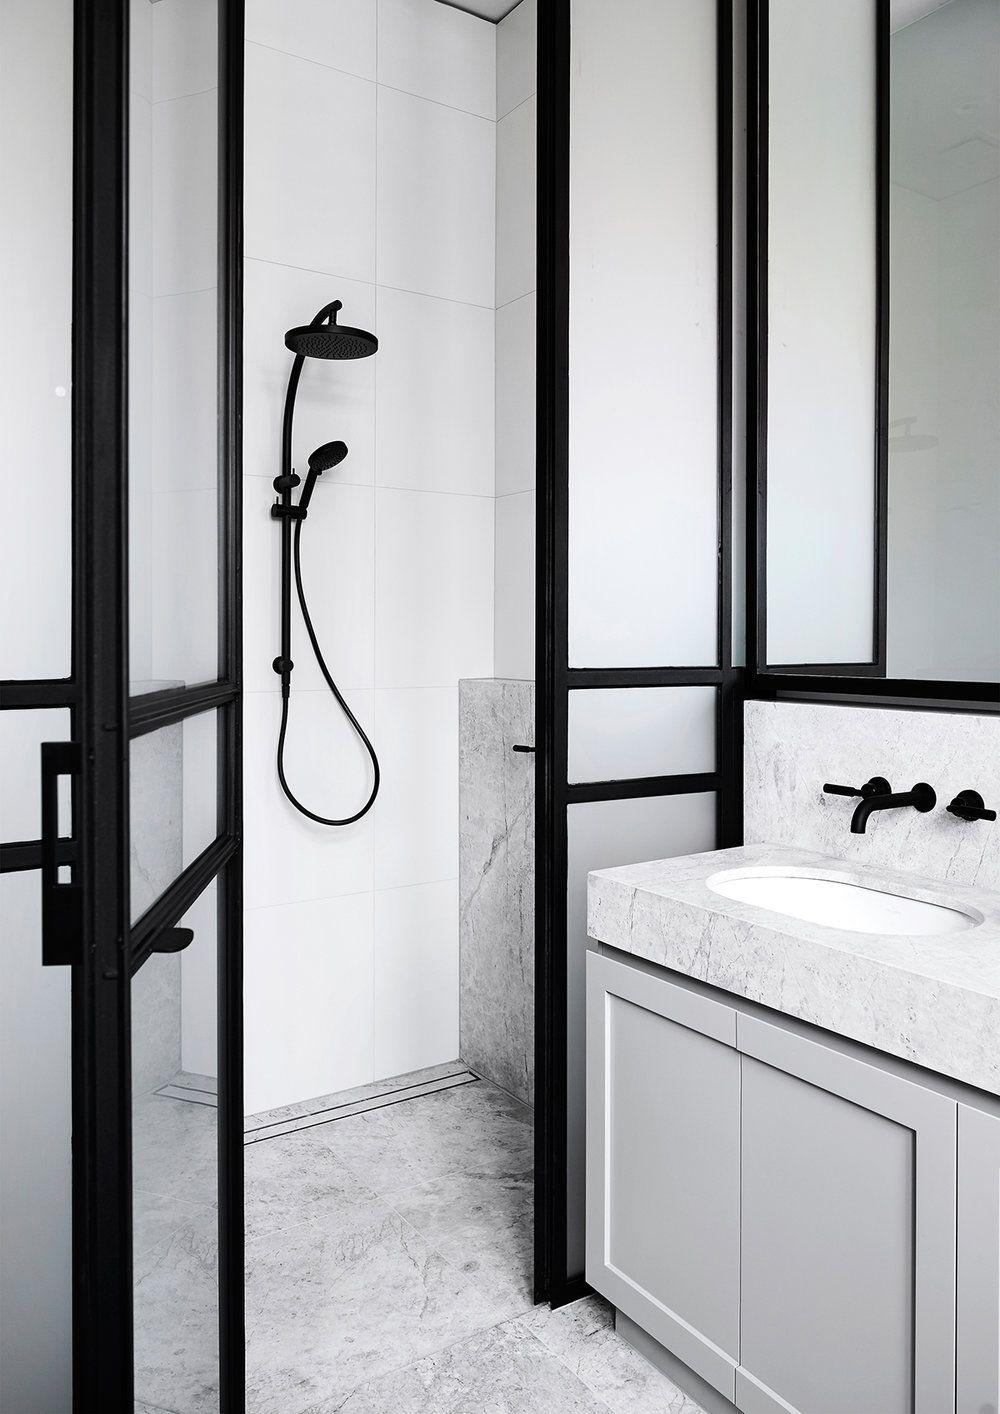 Top 5 Bathroom Trends For 2017 Bathroom Trends Mim Design Bathroom Interior